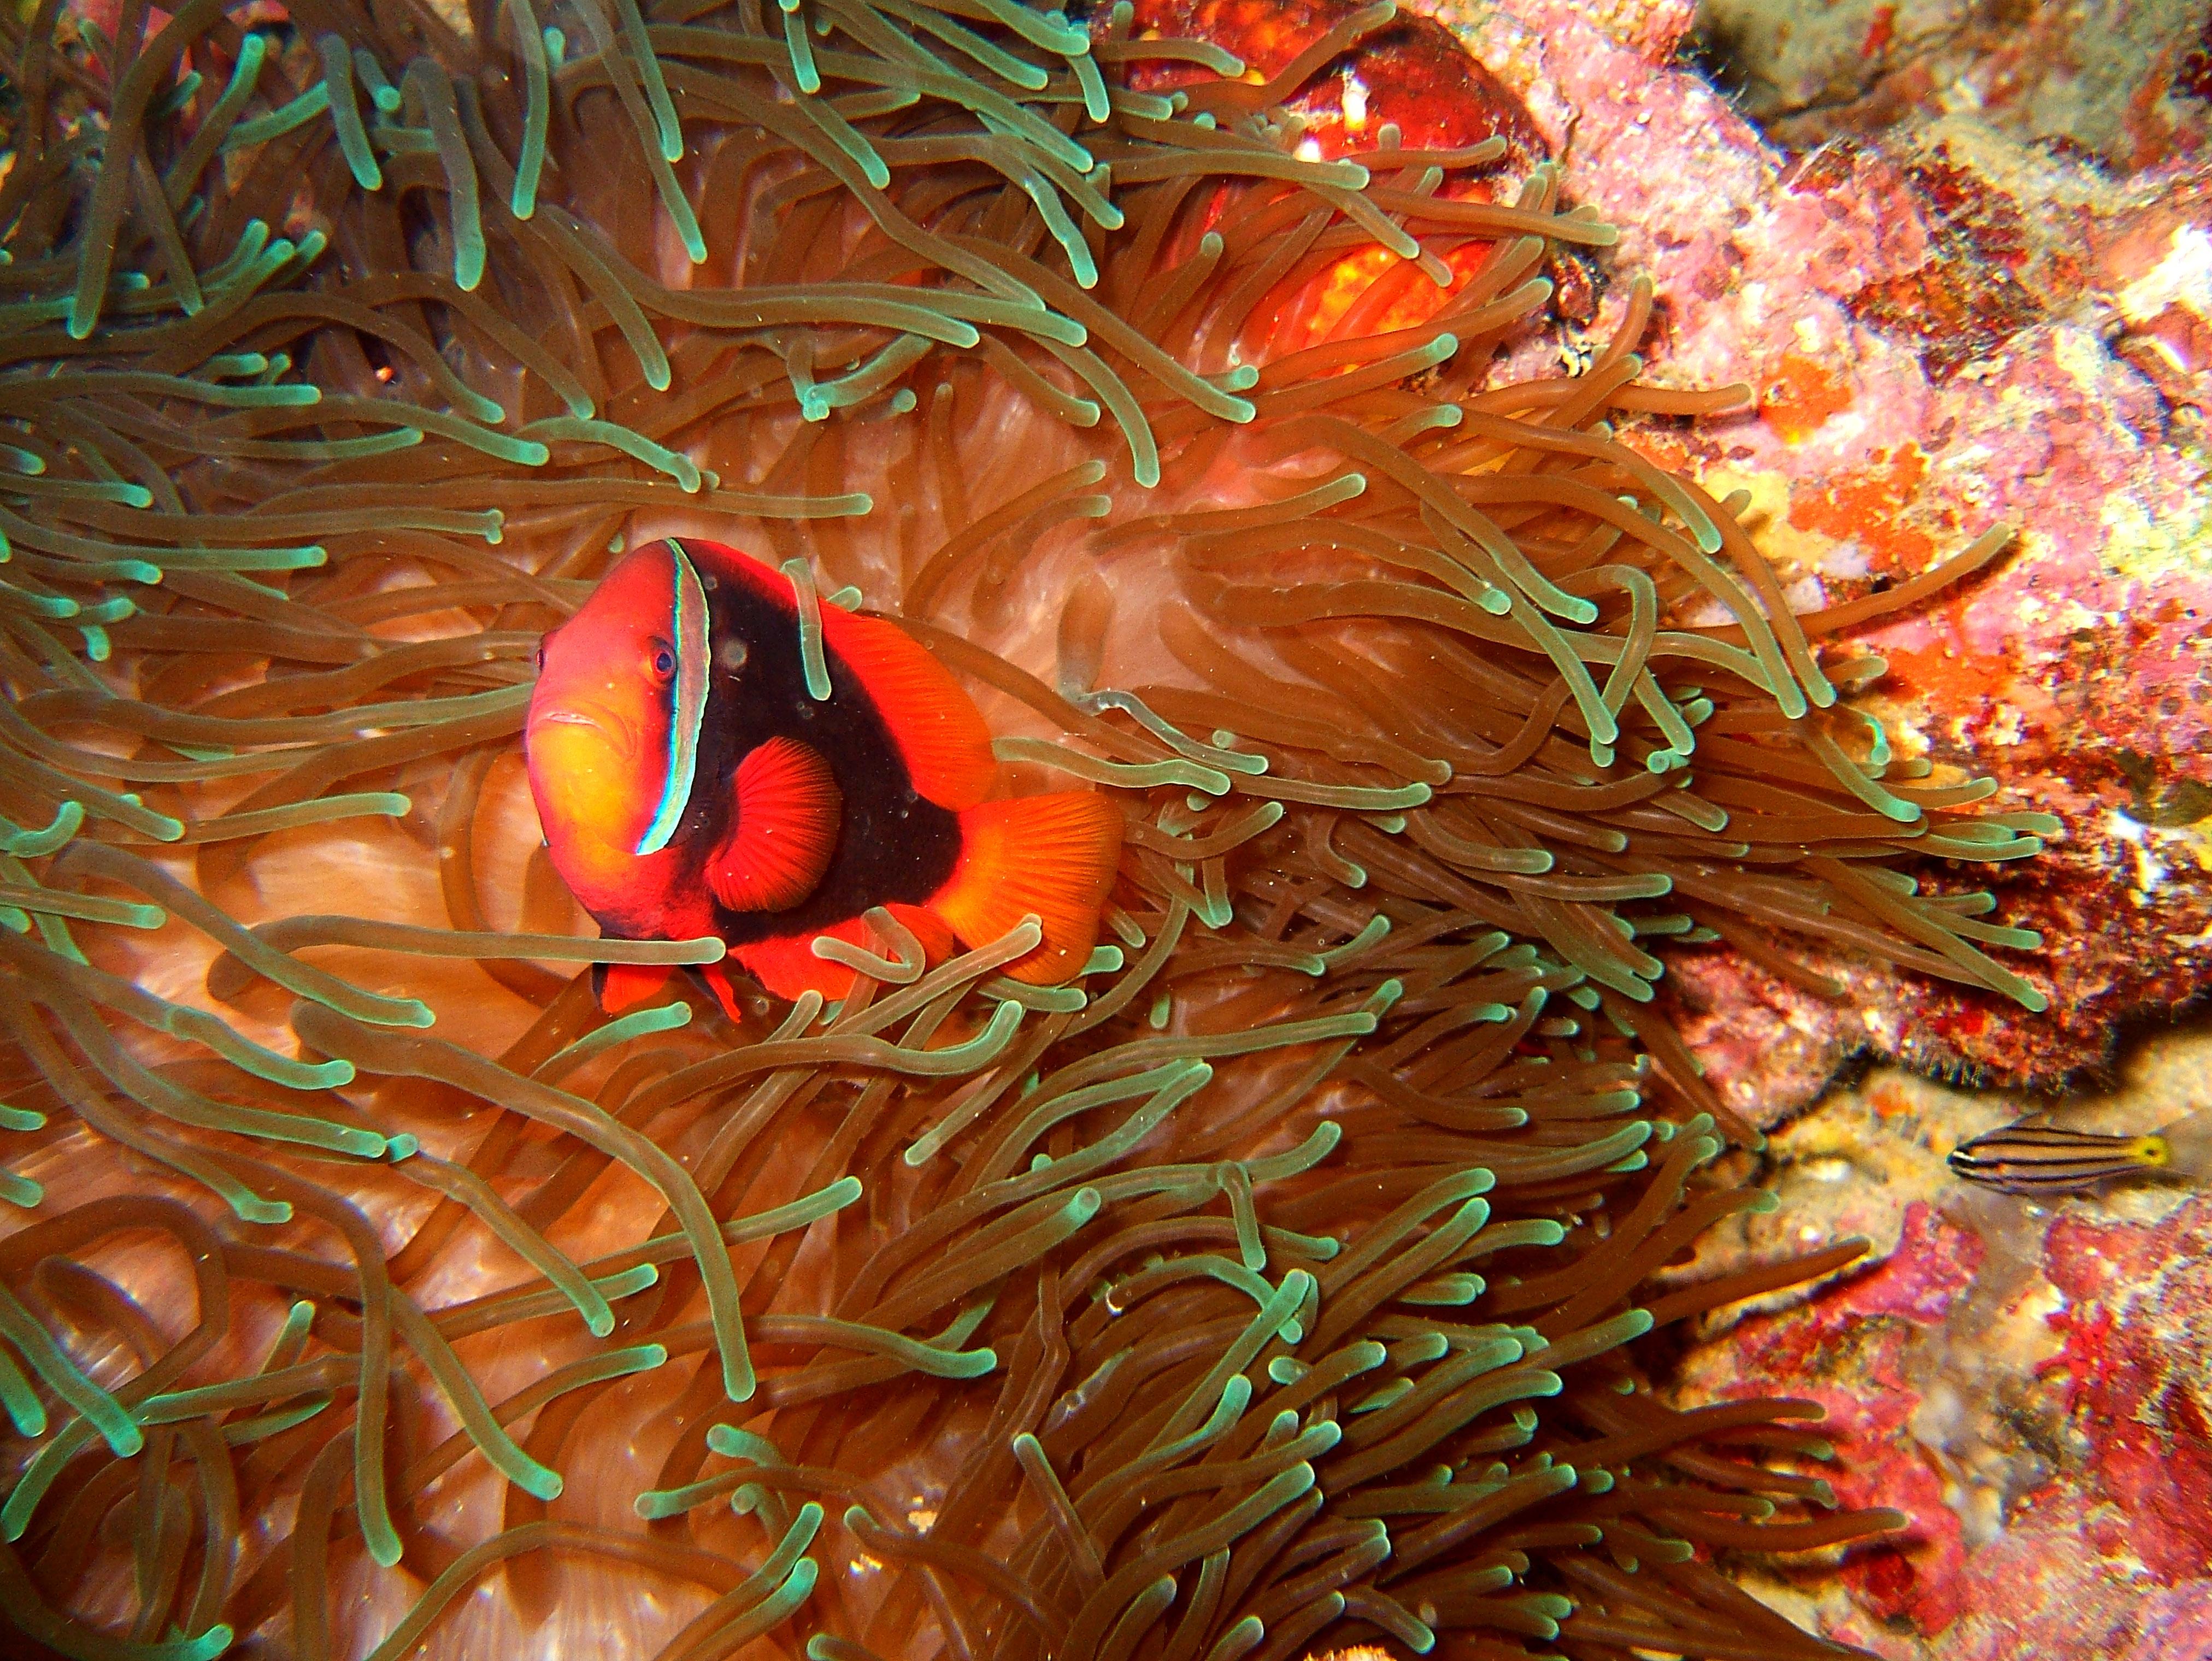 Philippines Cebu Moal Boal 20051226 Dive 1 Kasai Point 28